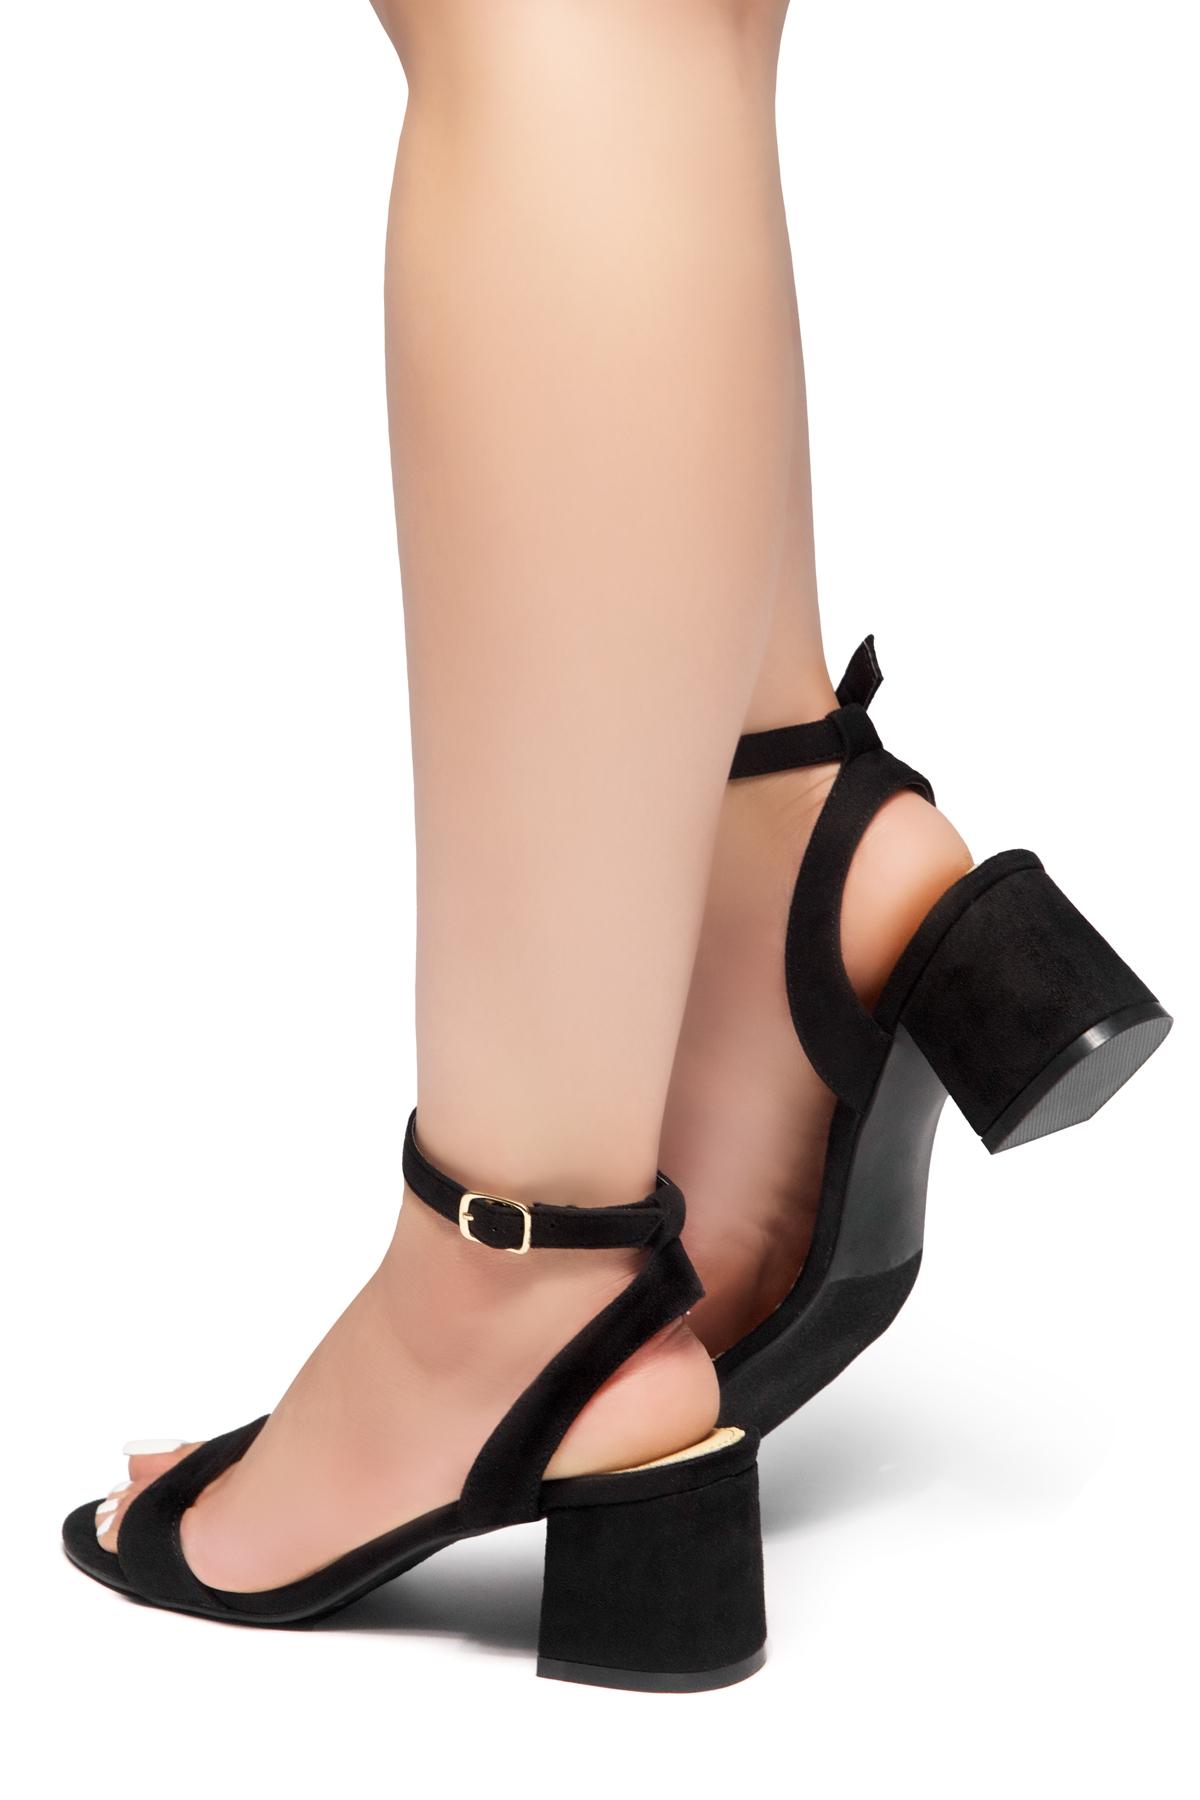 27344635342 HerStyle KEEPTALKING-Suede Open Toe Ankle Strap Low Chunky Heel Sandal  (Black)